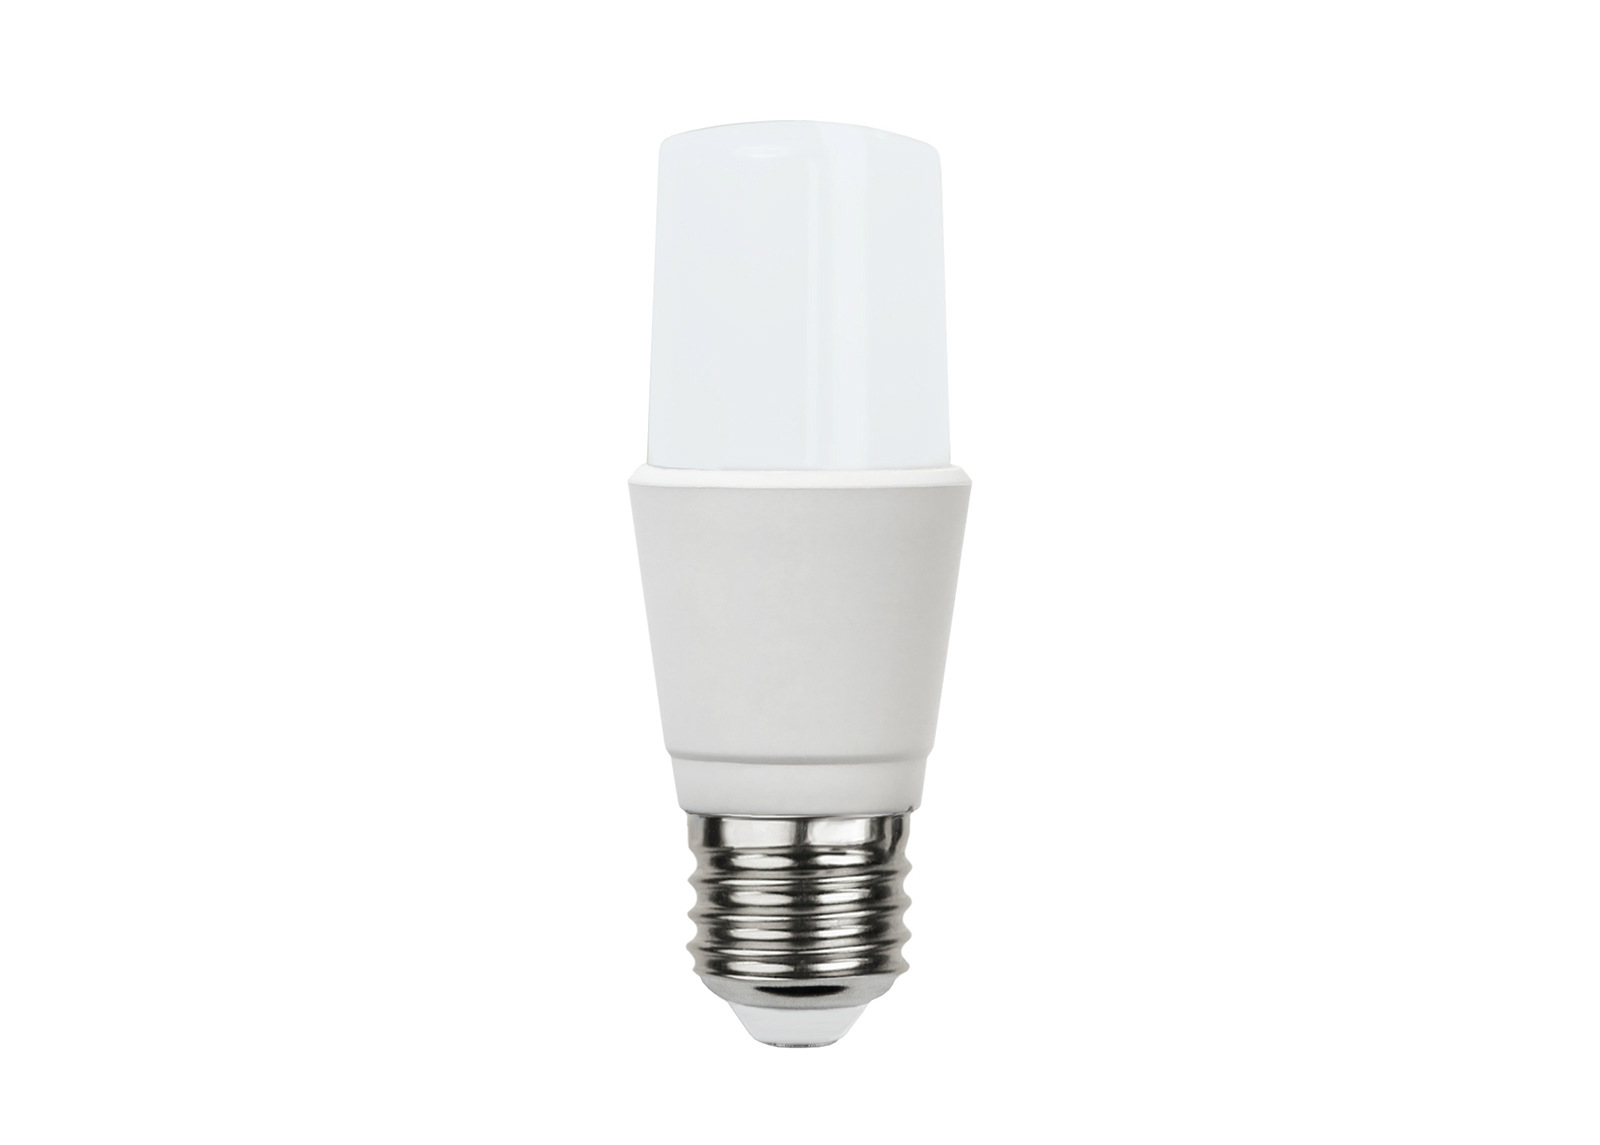 LED sähkölamppu E27 8,2 W